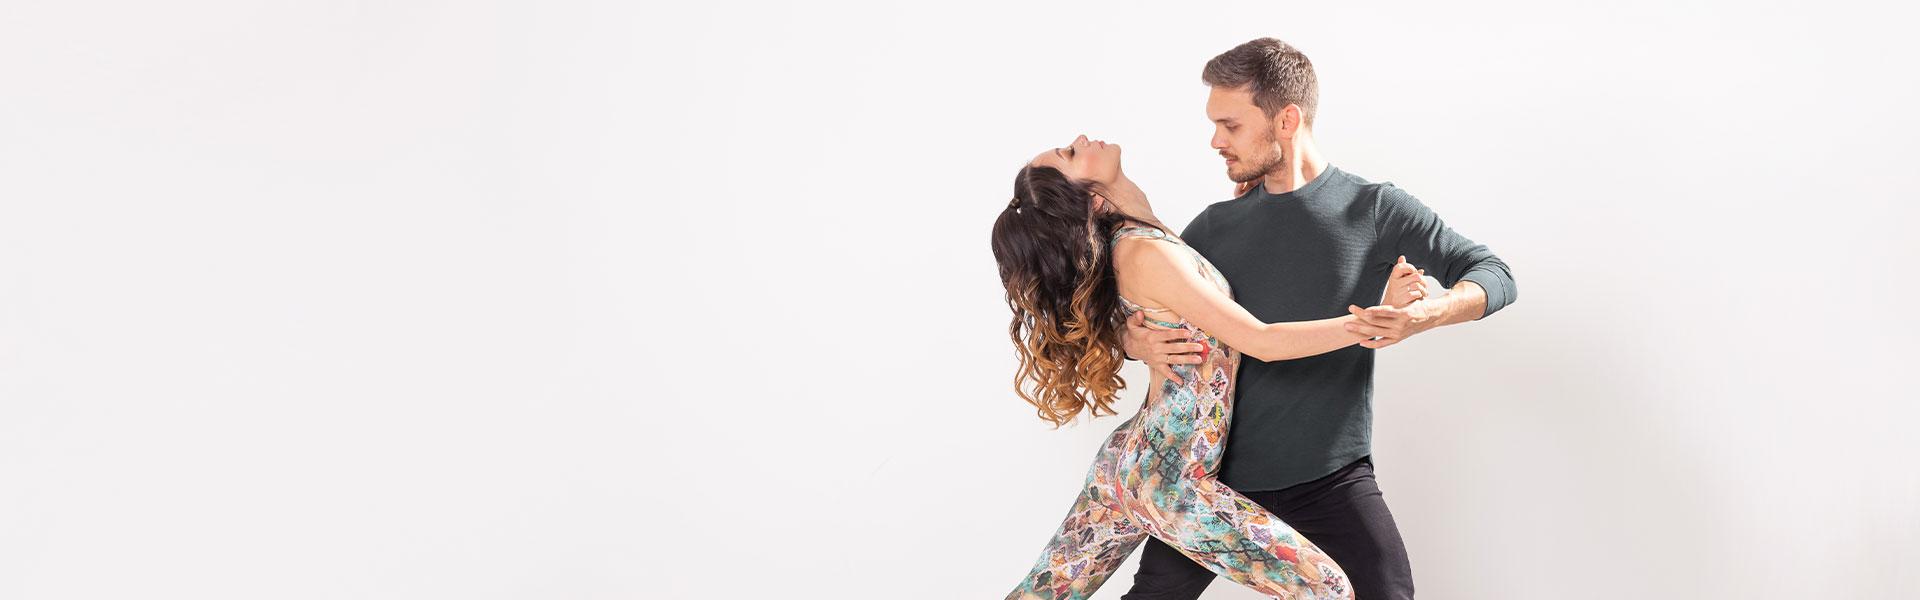 Tanzkurse Erwachsene Ansbach